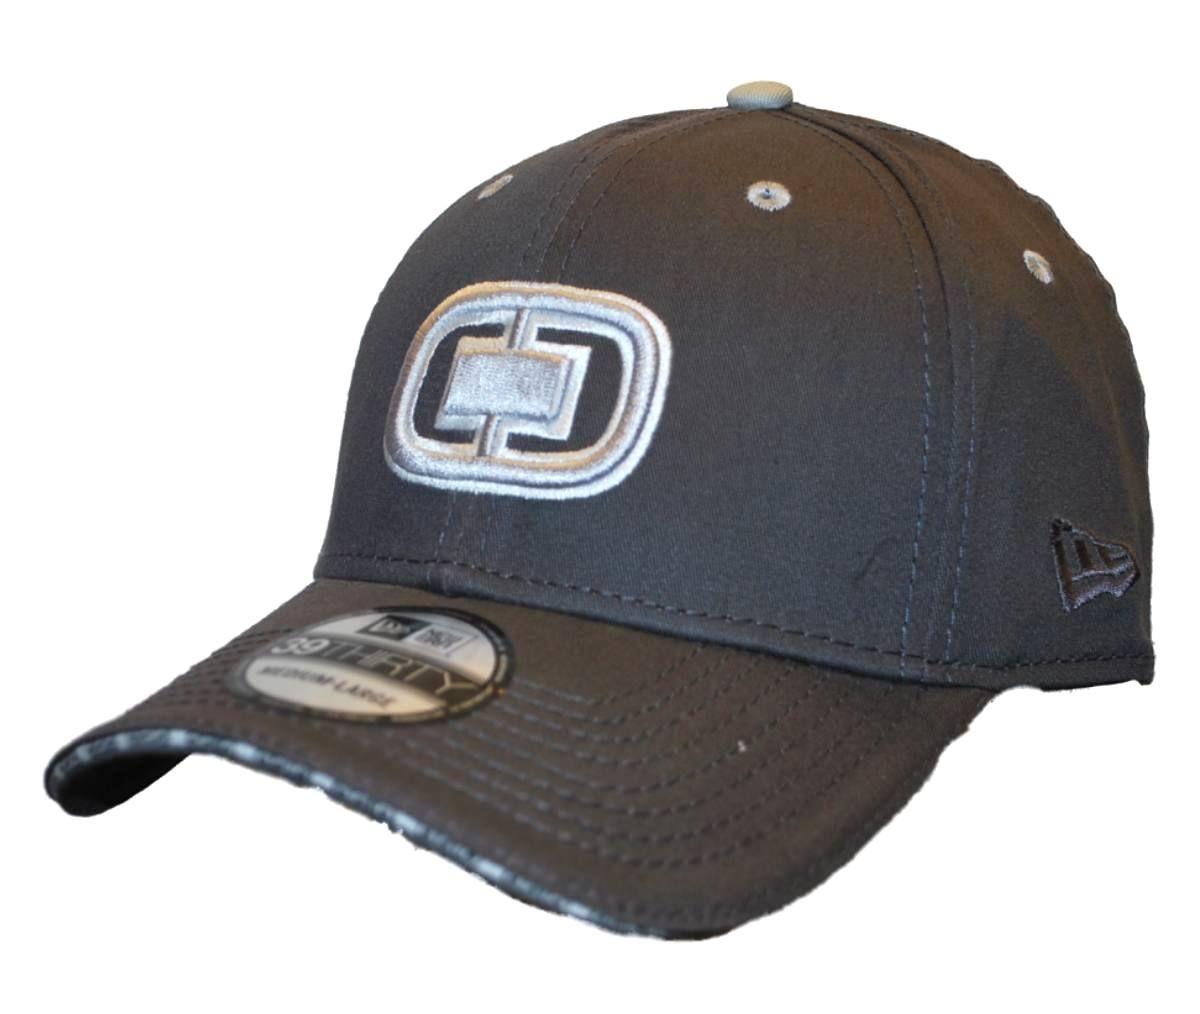 meet 5f058 05ad0 OGIO New Era 39Thirty Slate Gray Flexfit Golf Hat Cap